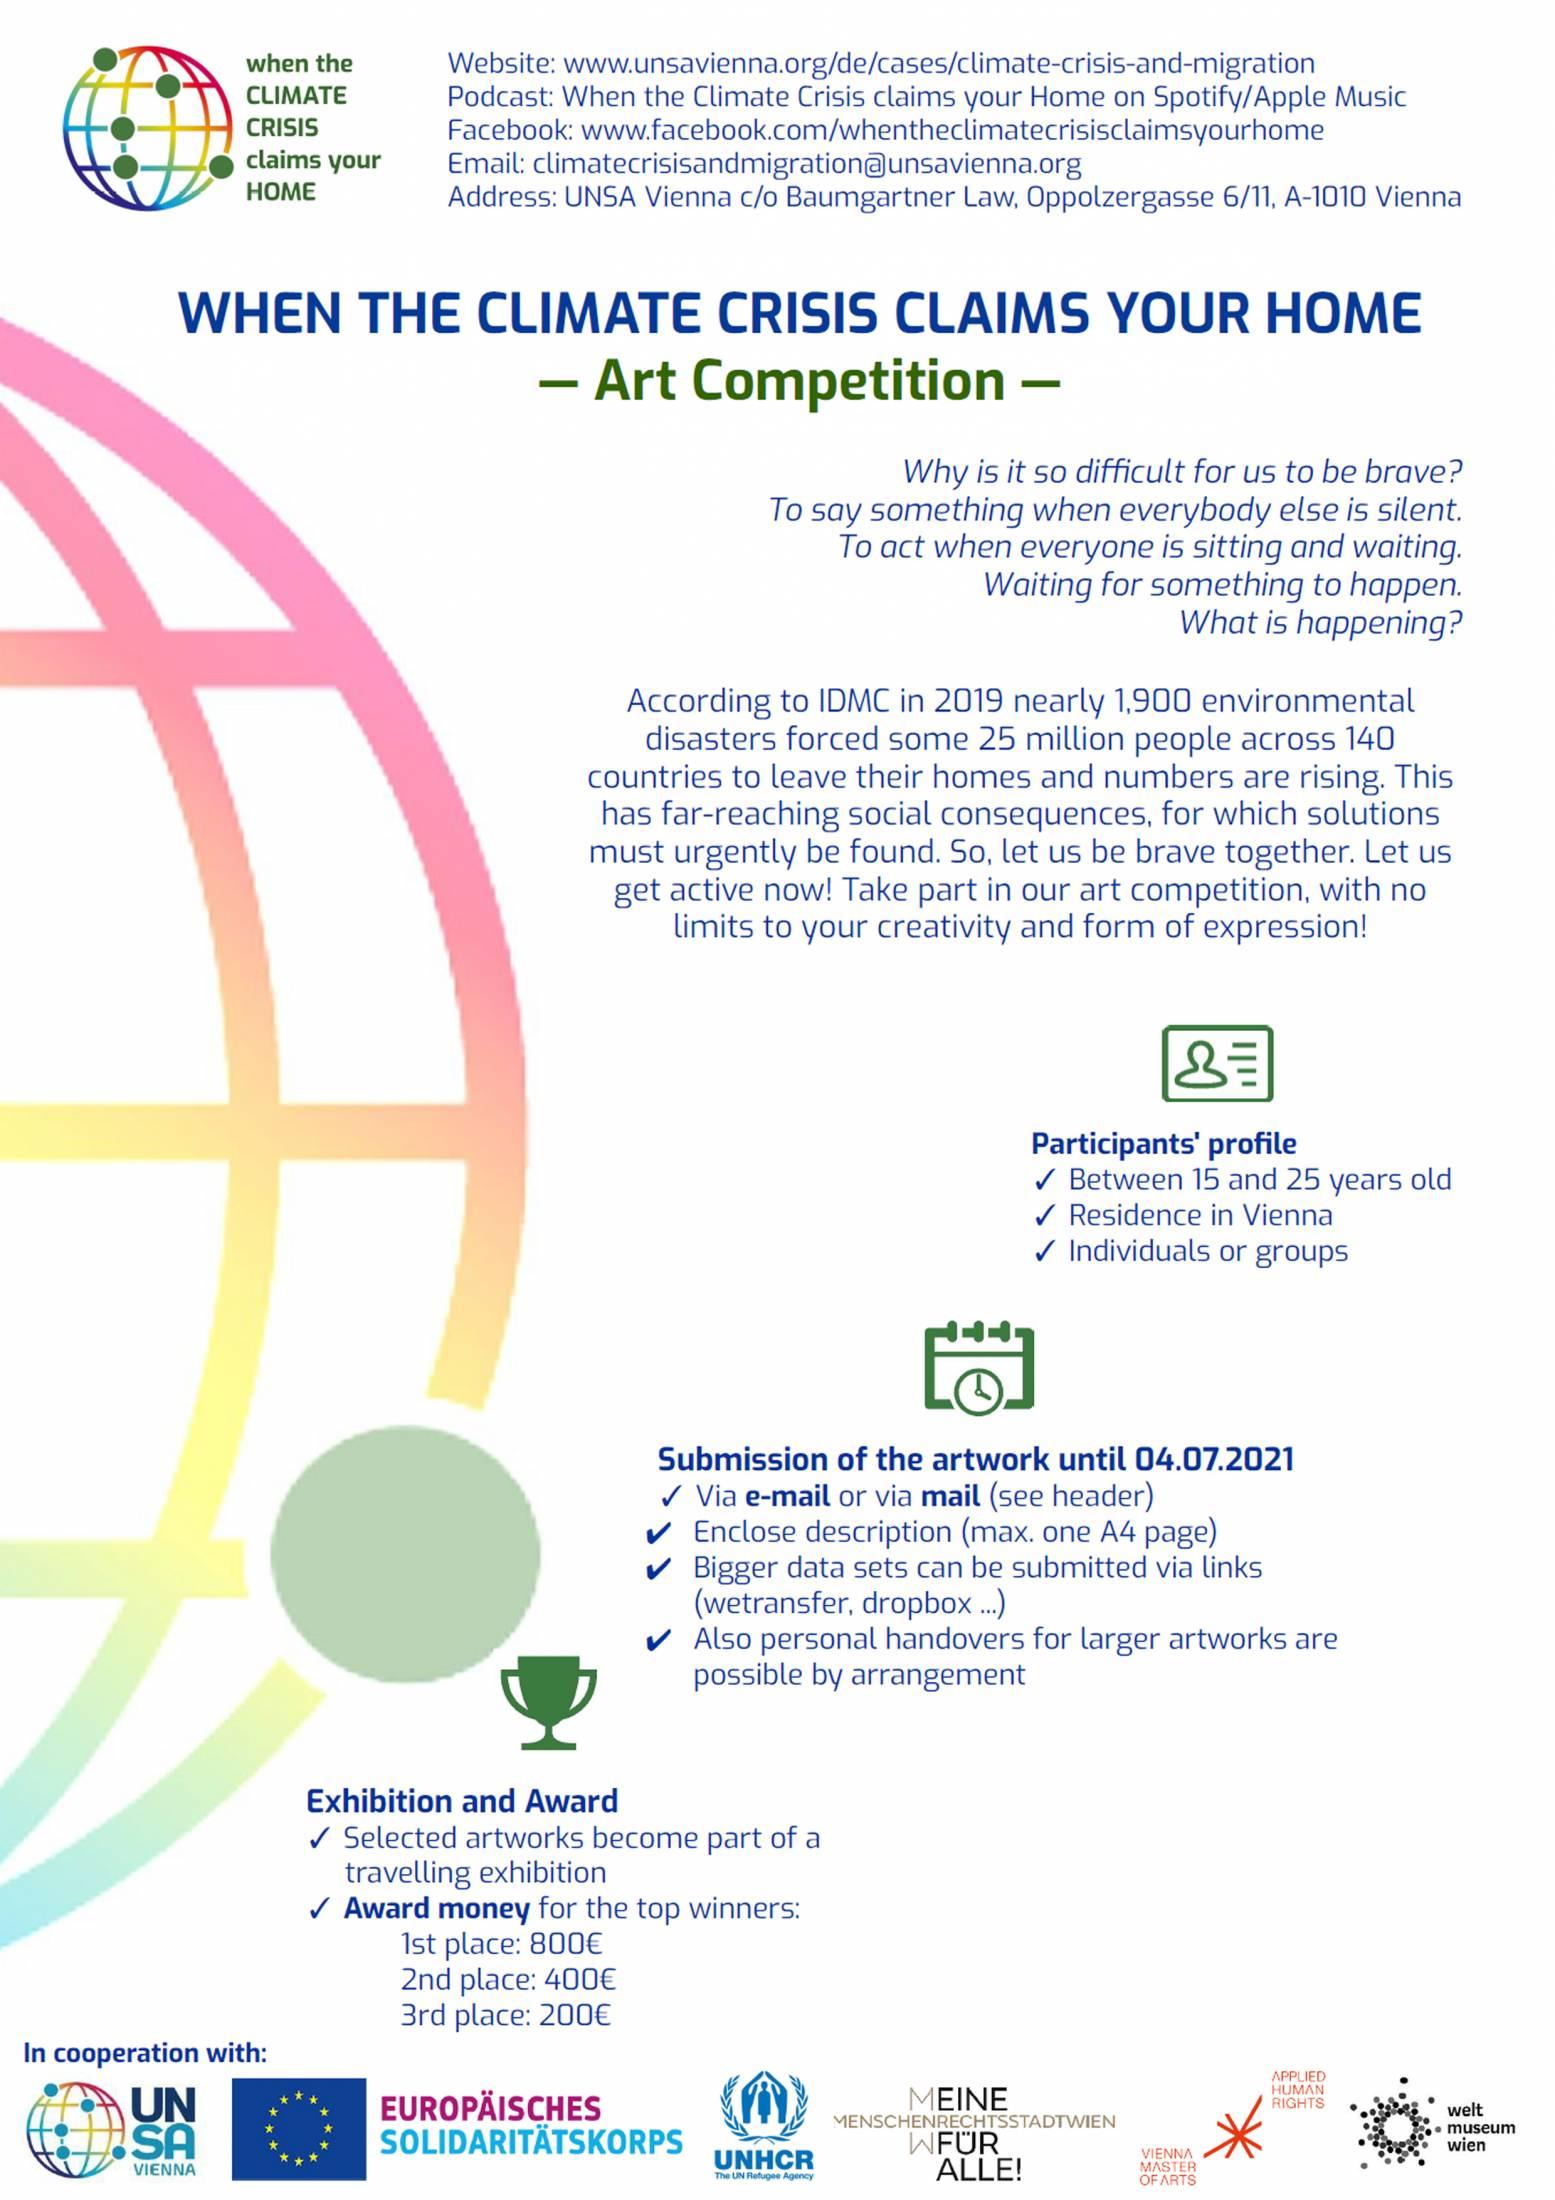 UNSA VIENNA – art-competition